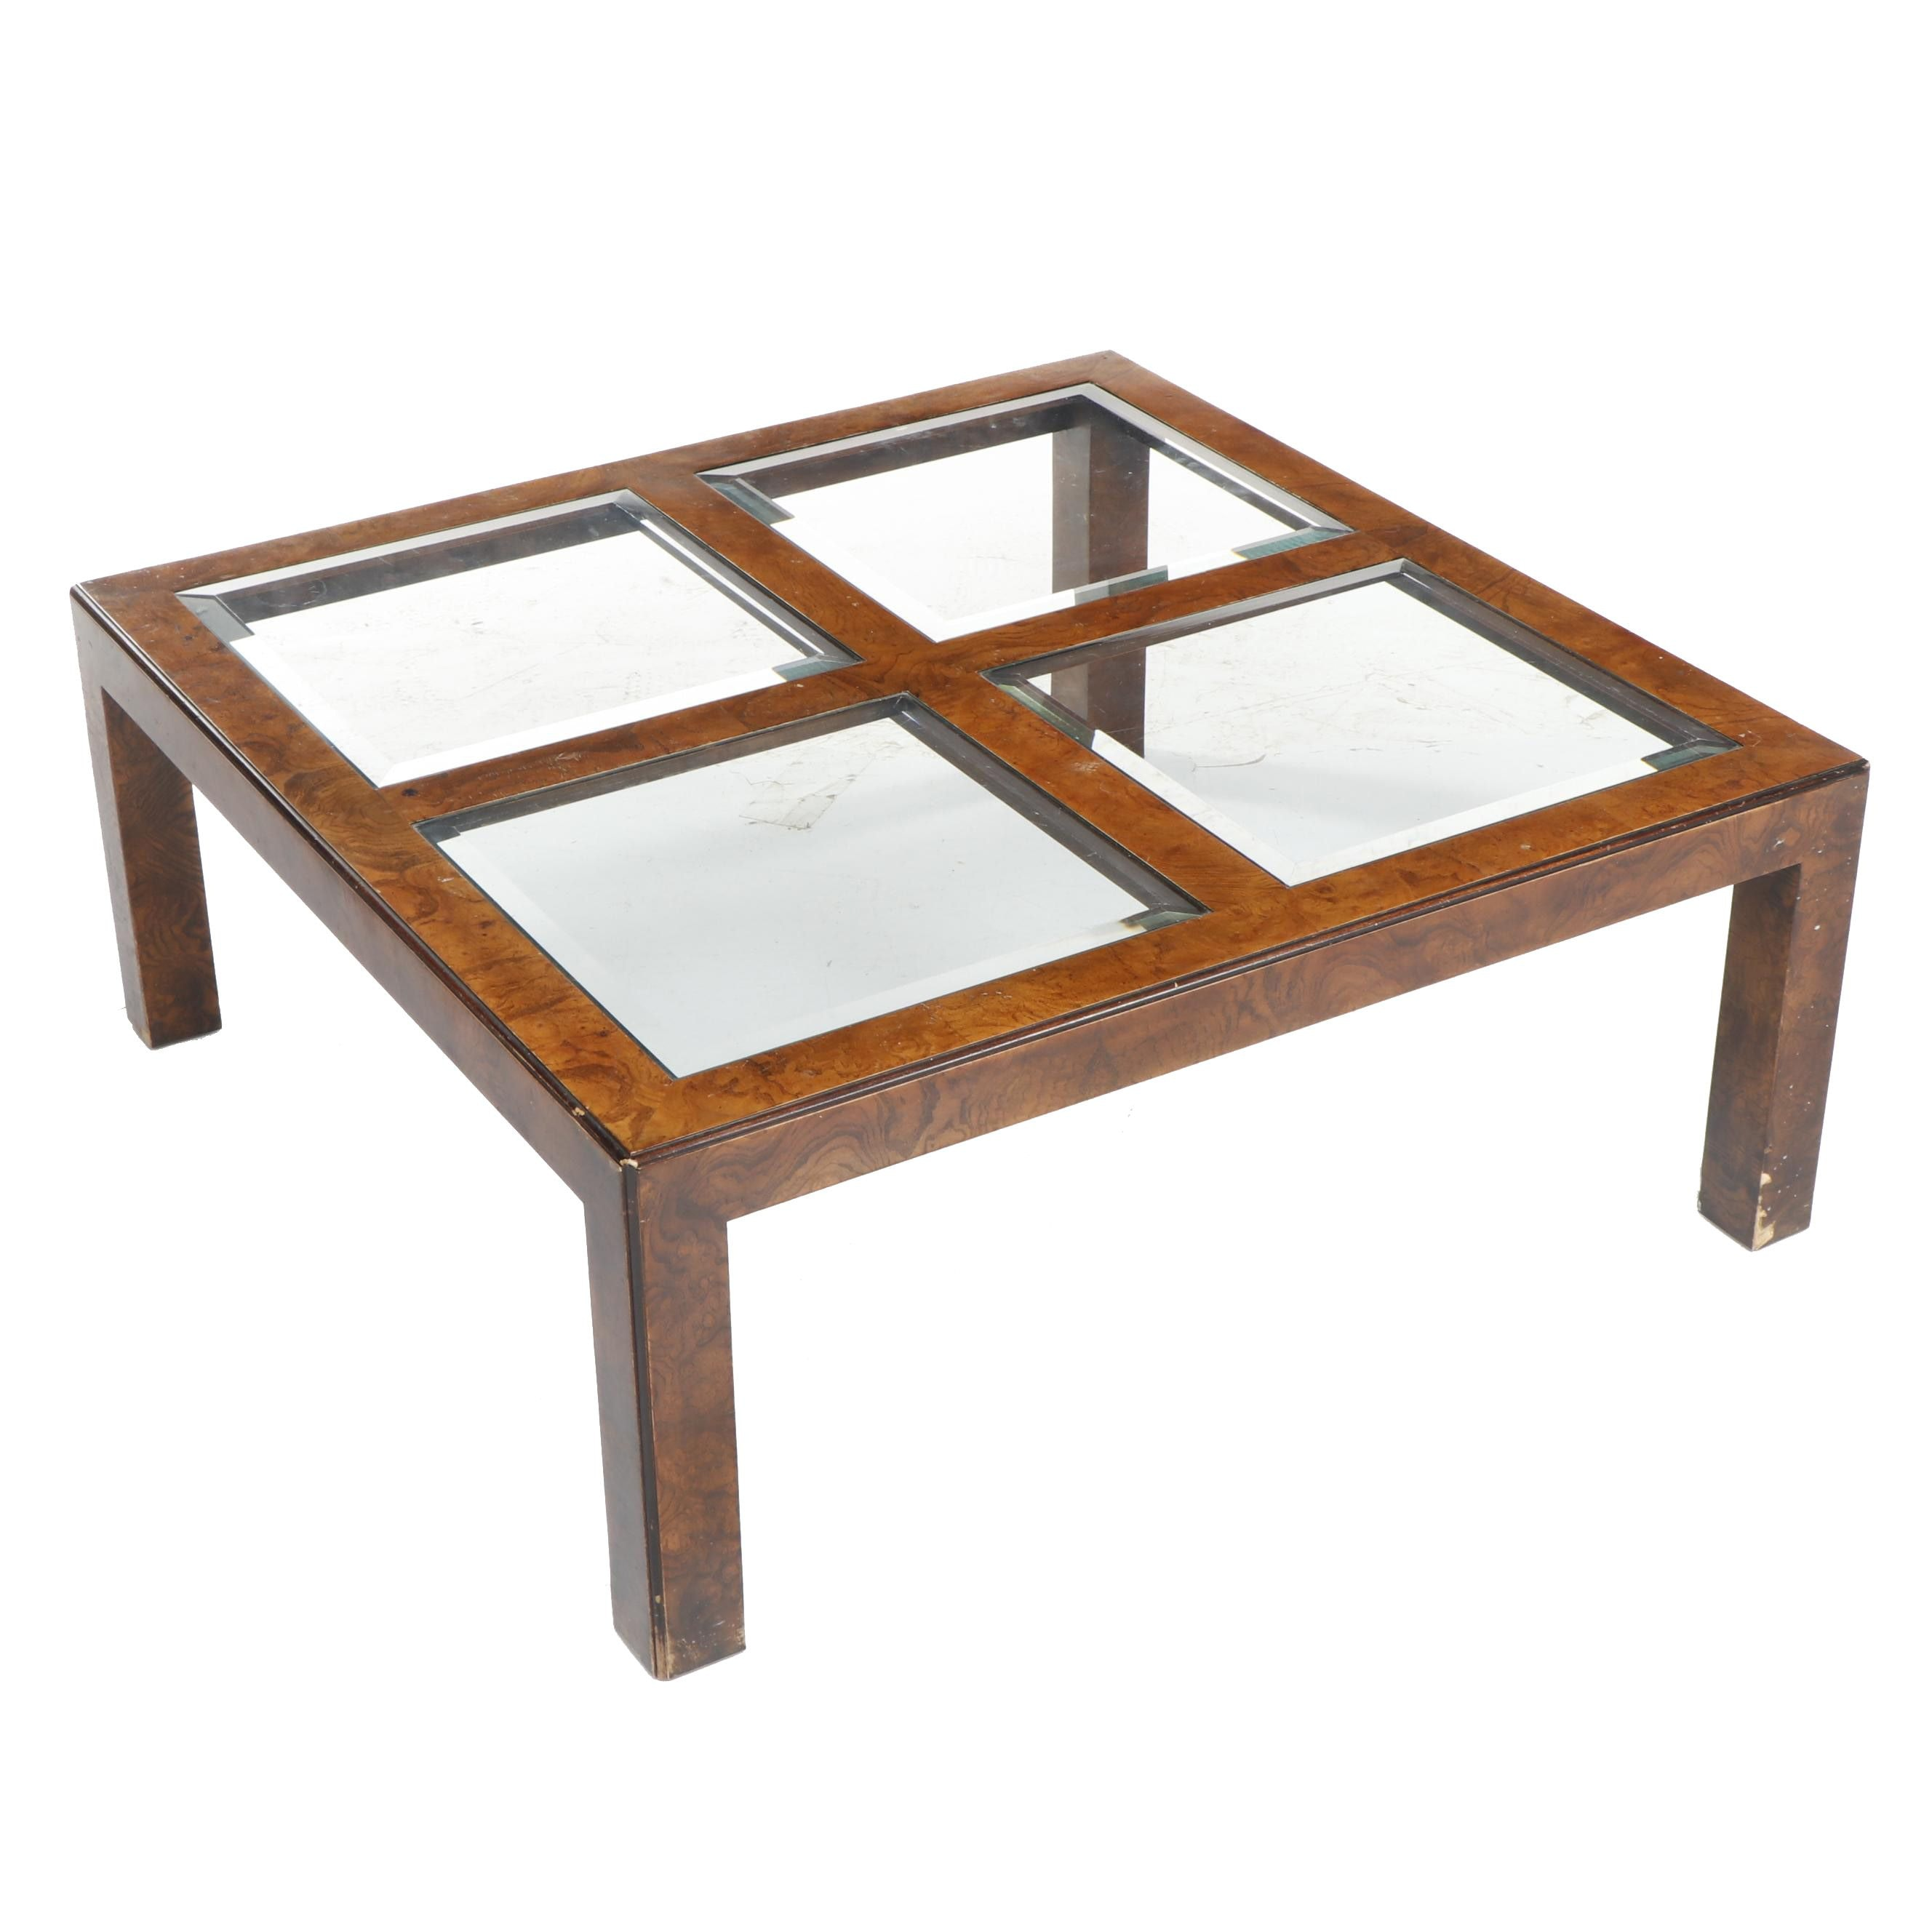 John Widdicomb Burled Oak Glass Top Coffee Table, Mid 20th Century